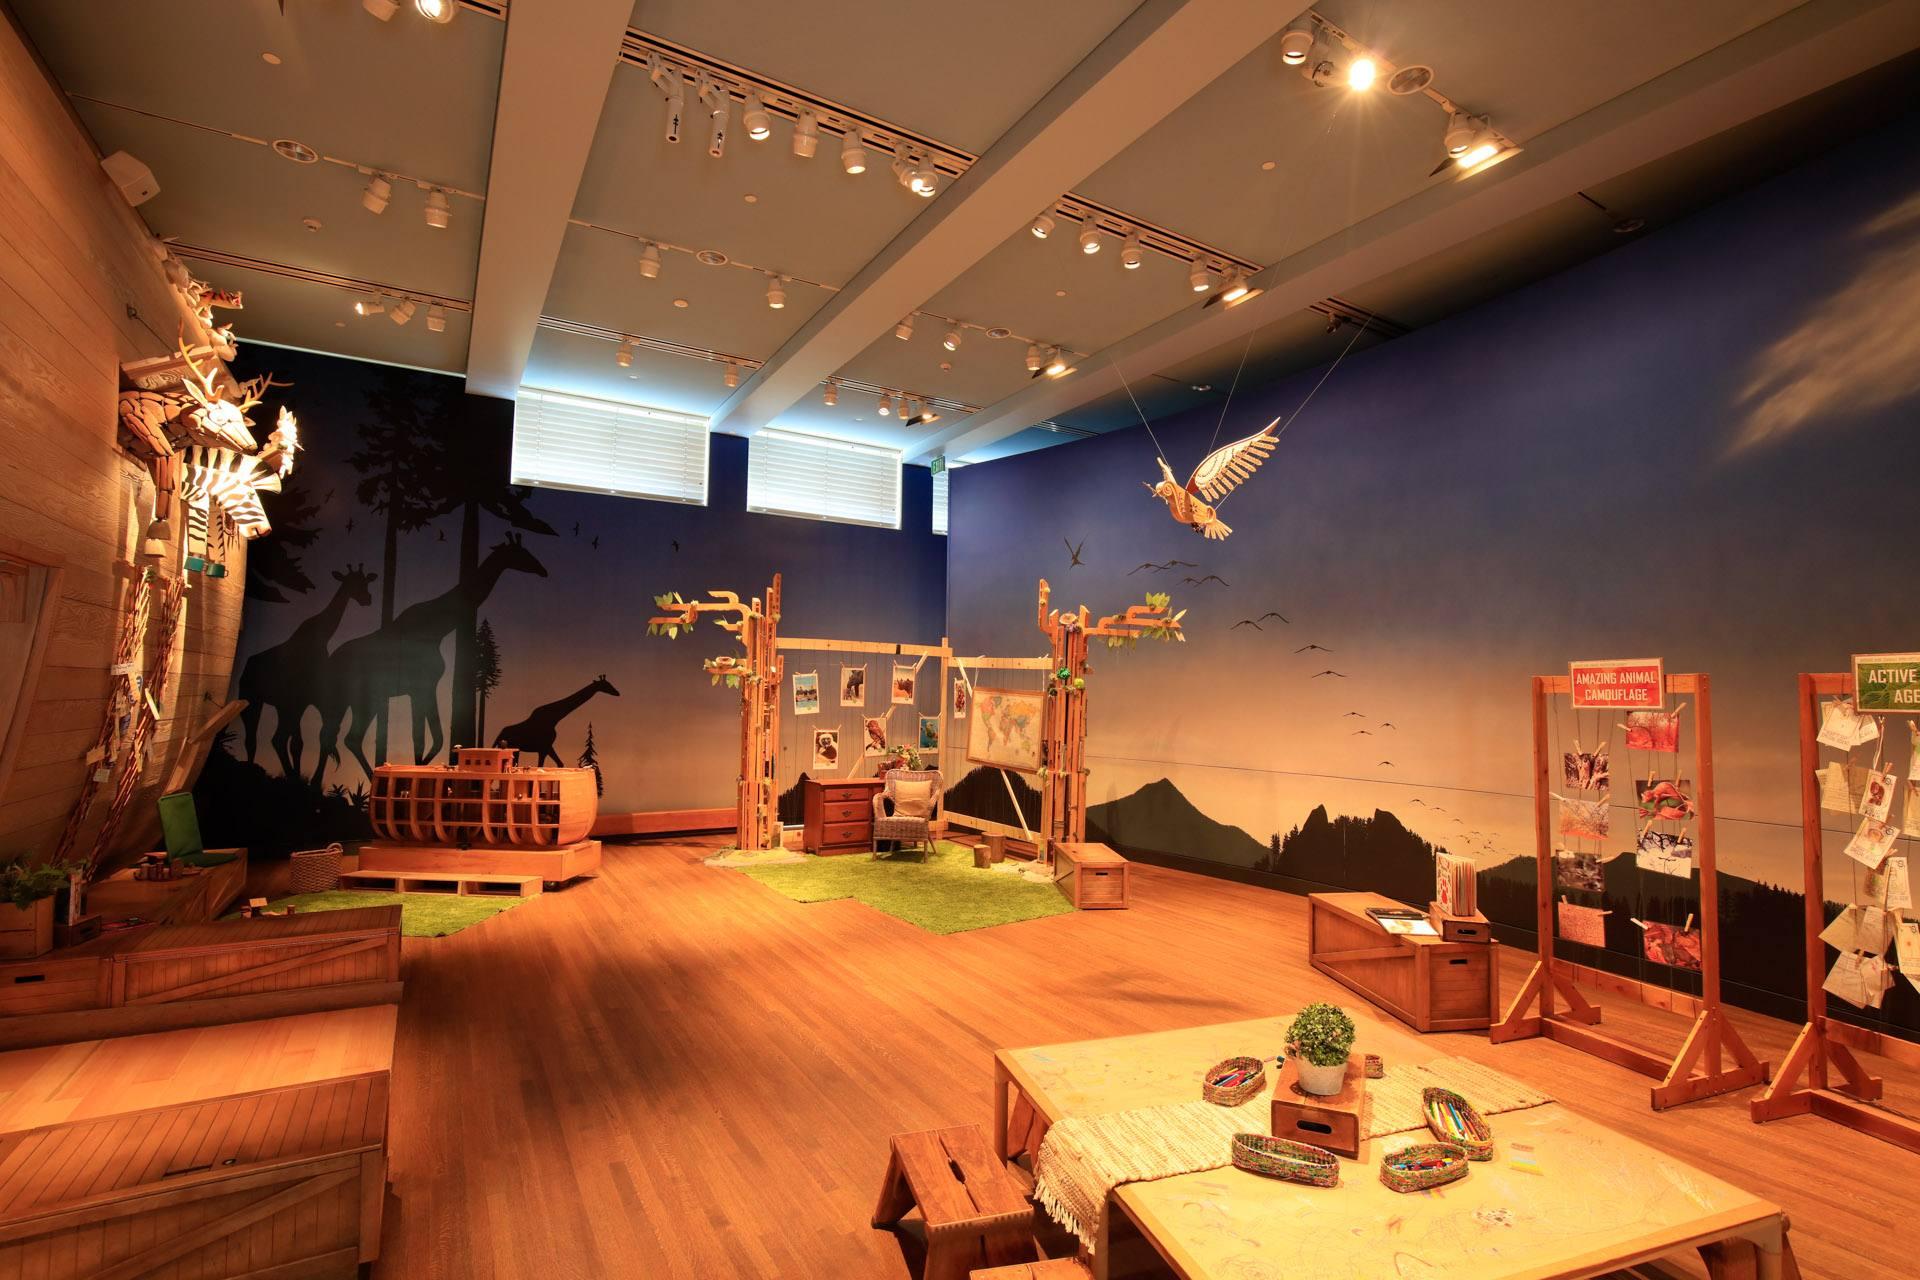 Noah's Ark at Skirball Cultural Center